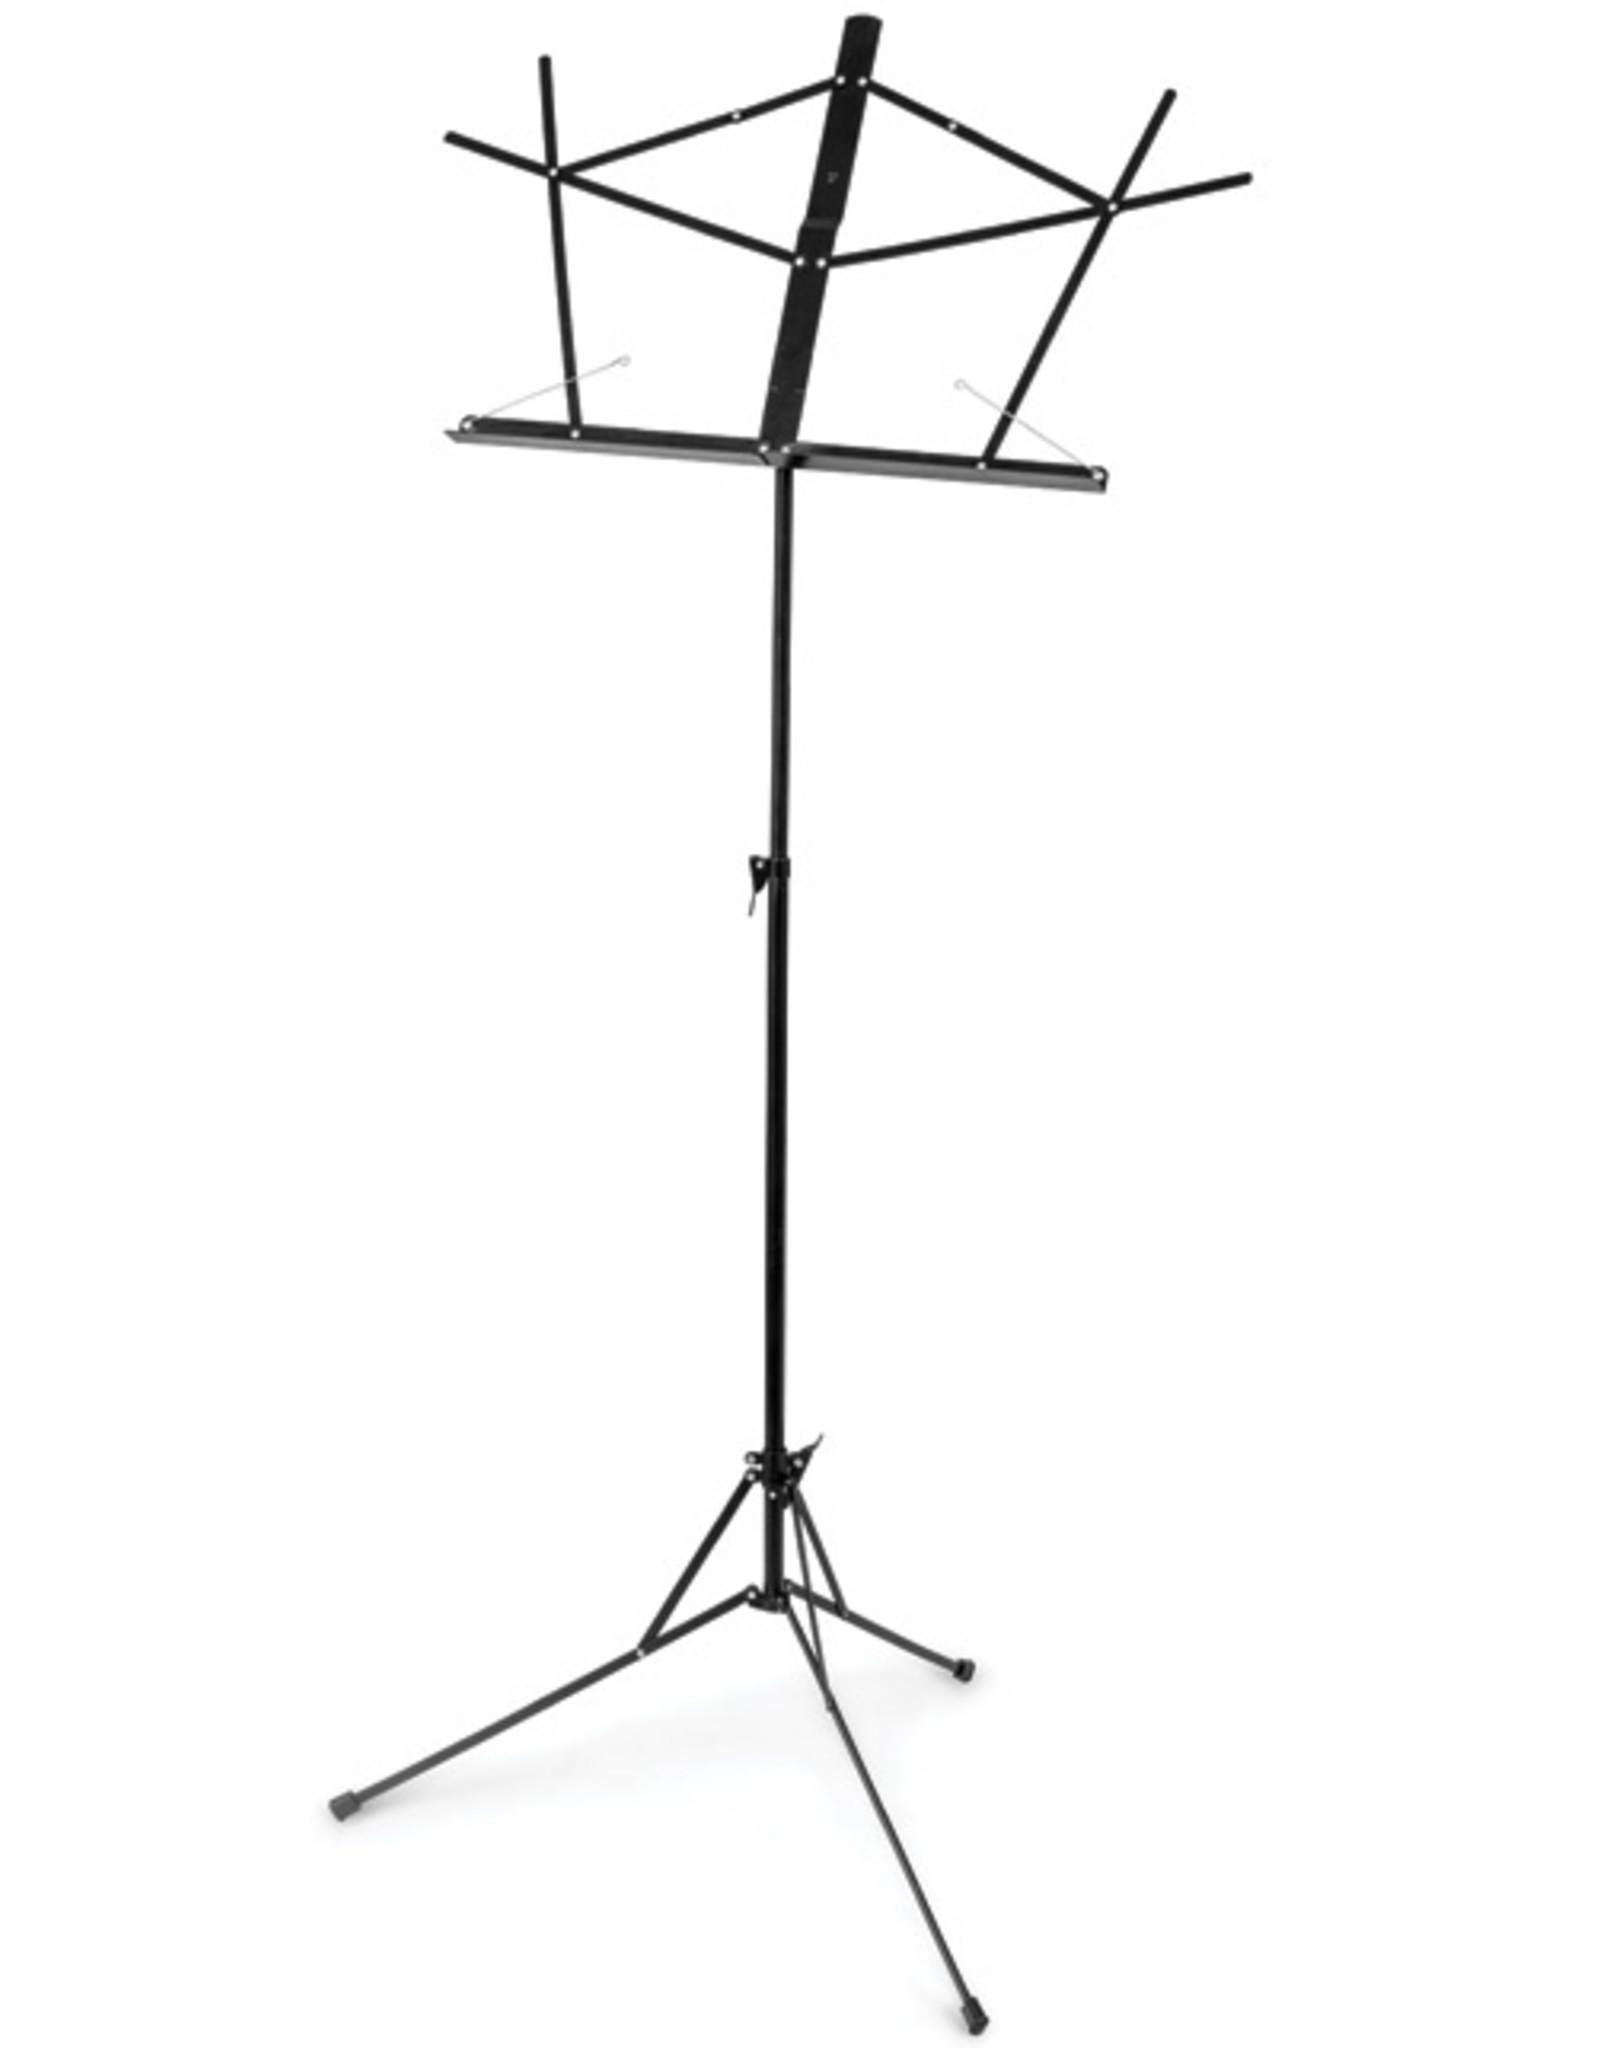 Nomad Nomad Lightweight EZ-Angle Music Stand - Black